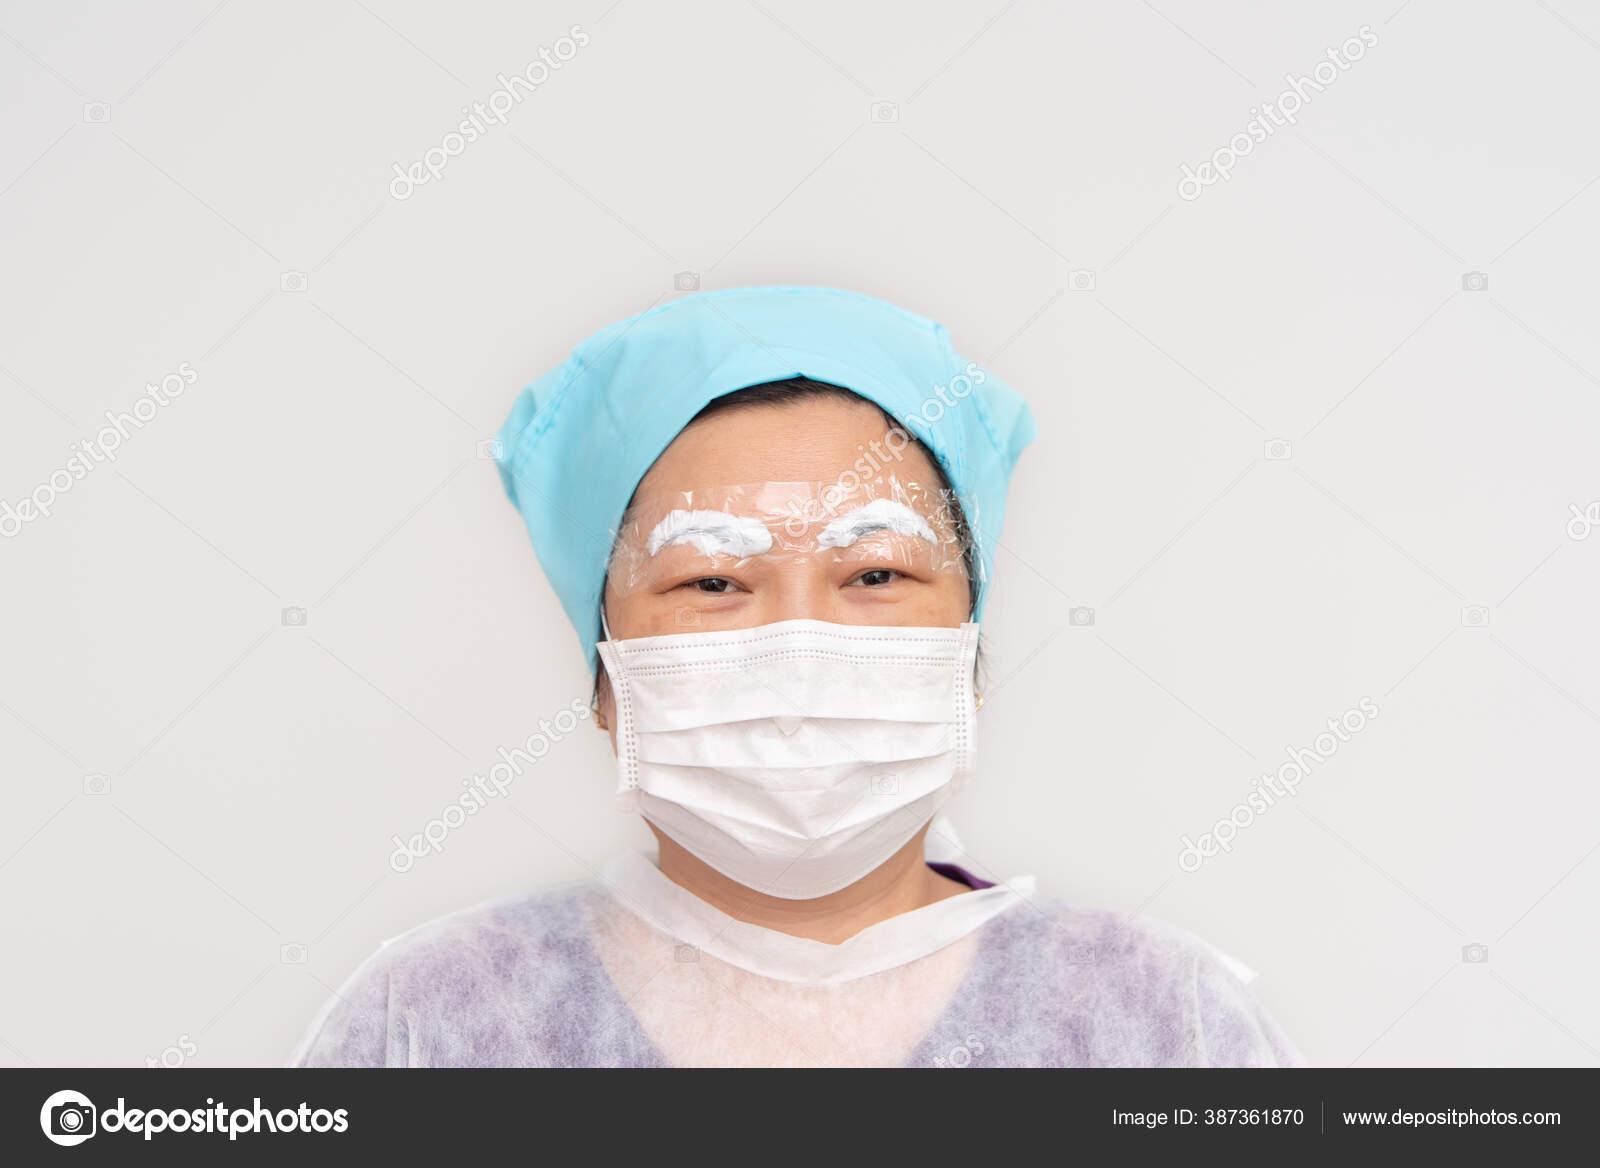 Asian Woman Eyebrow Tattooing Doctor Specialist Eyebrow Tattoo Clinic Eyebrow Stock Photo C Pongmoji 387361870